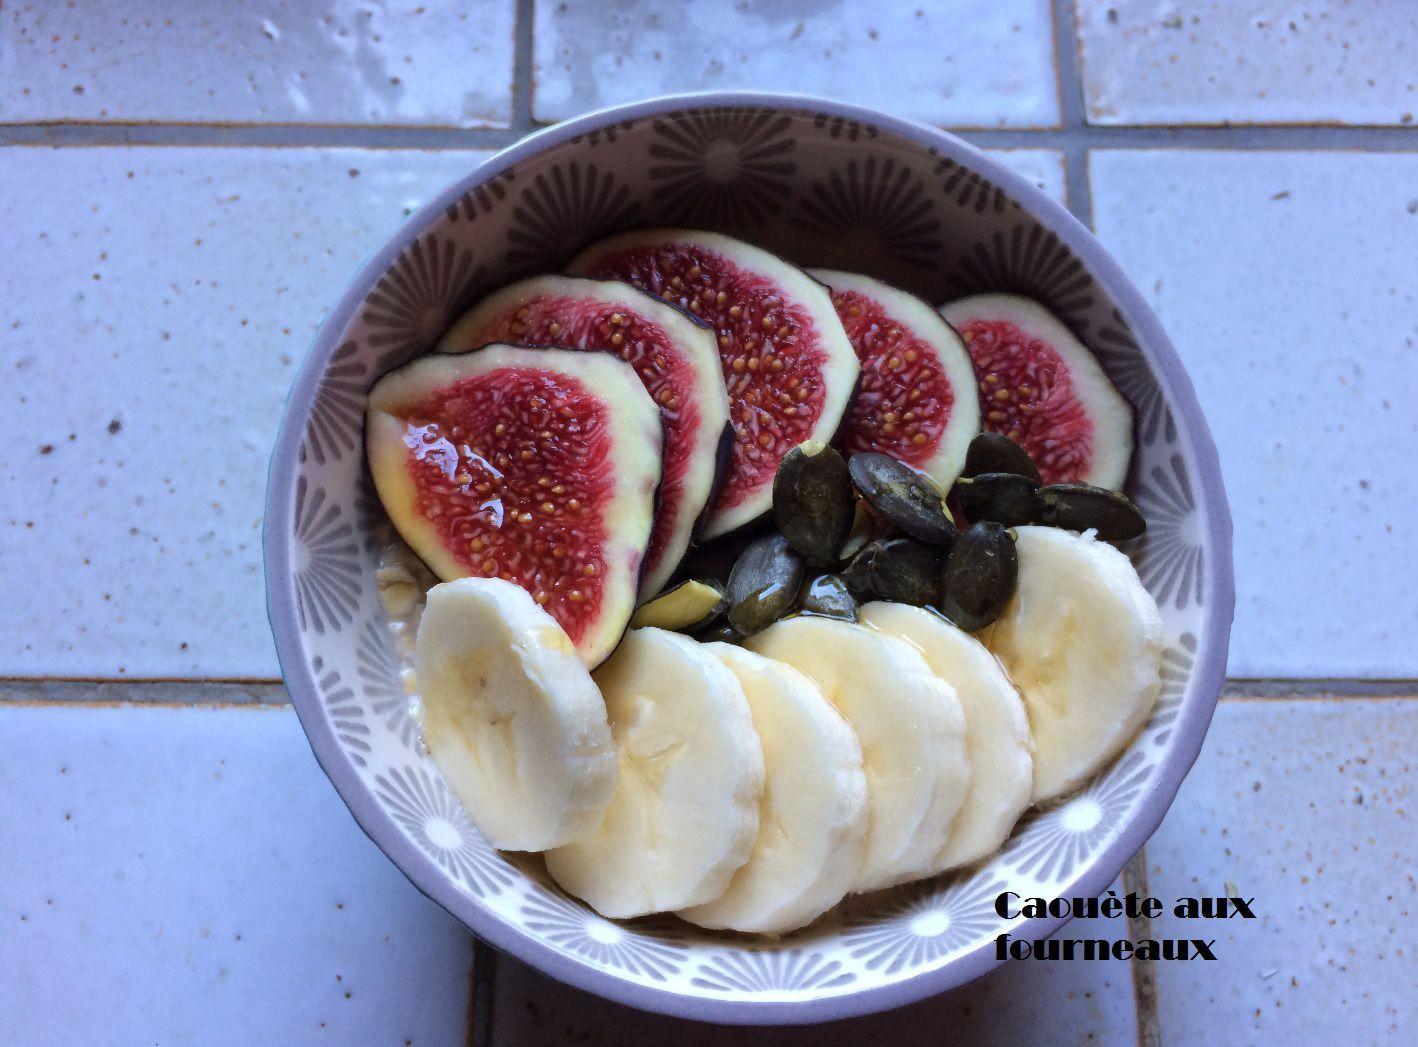 Healthy breakfast : flocons d'avoine, figue, banane, graines de courge